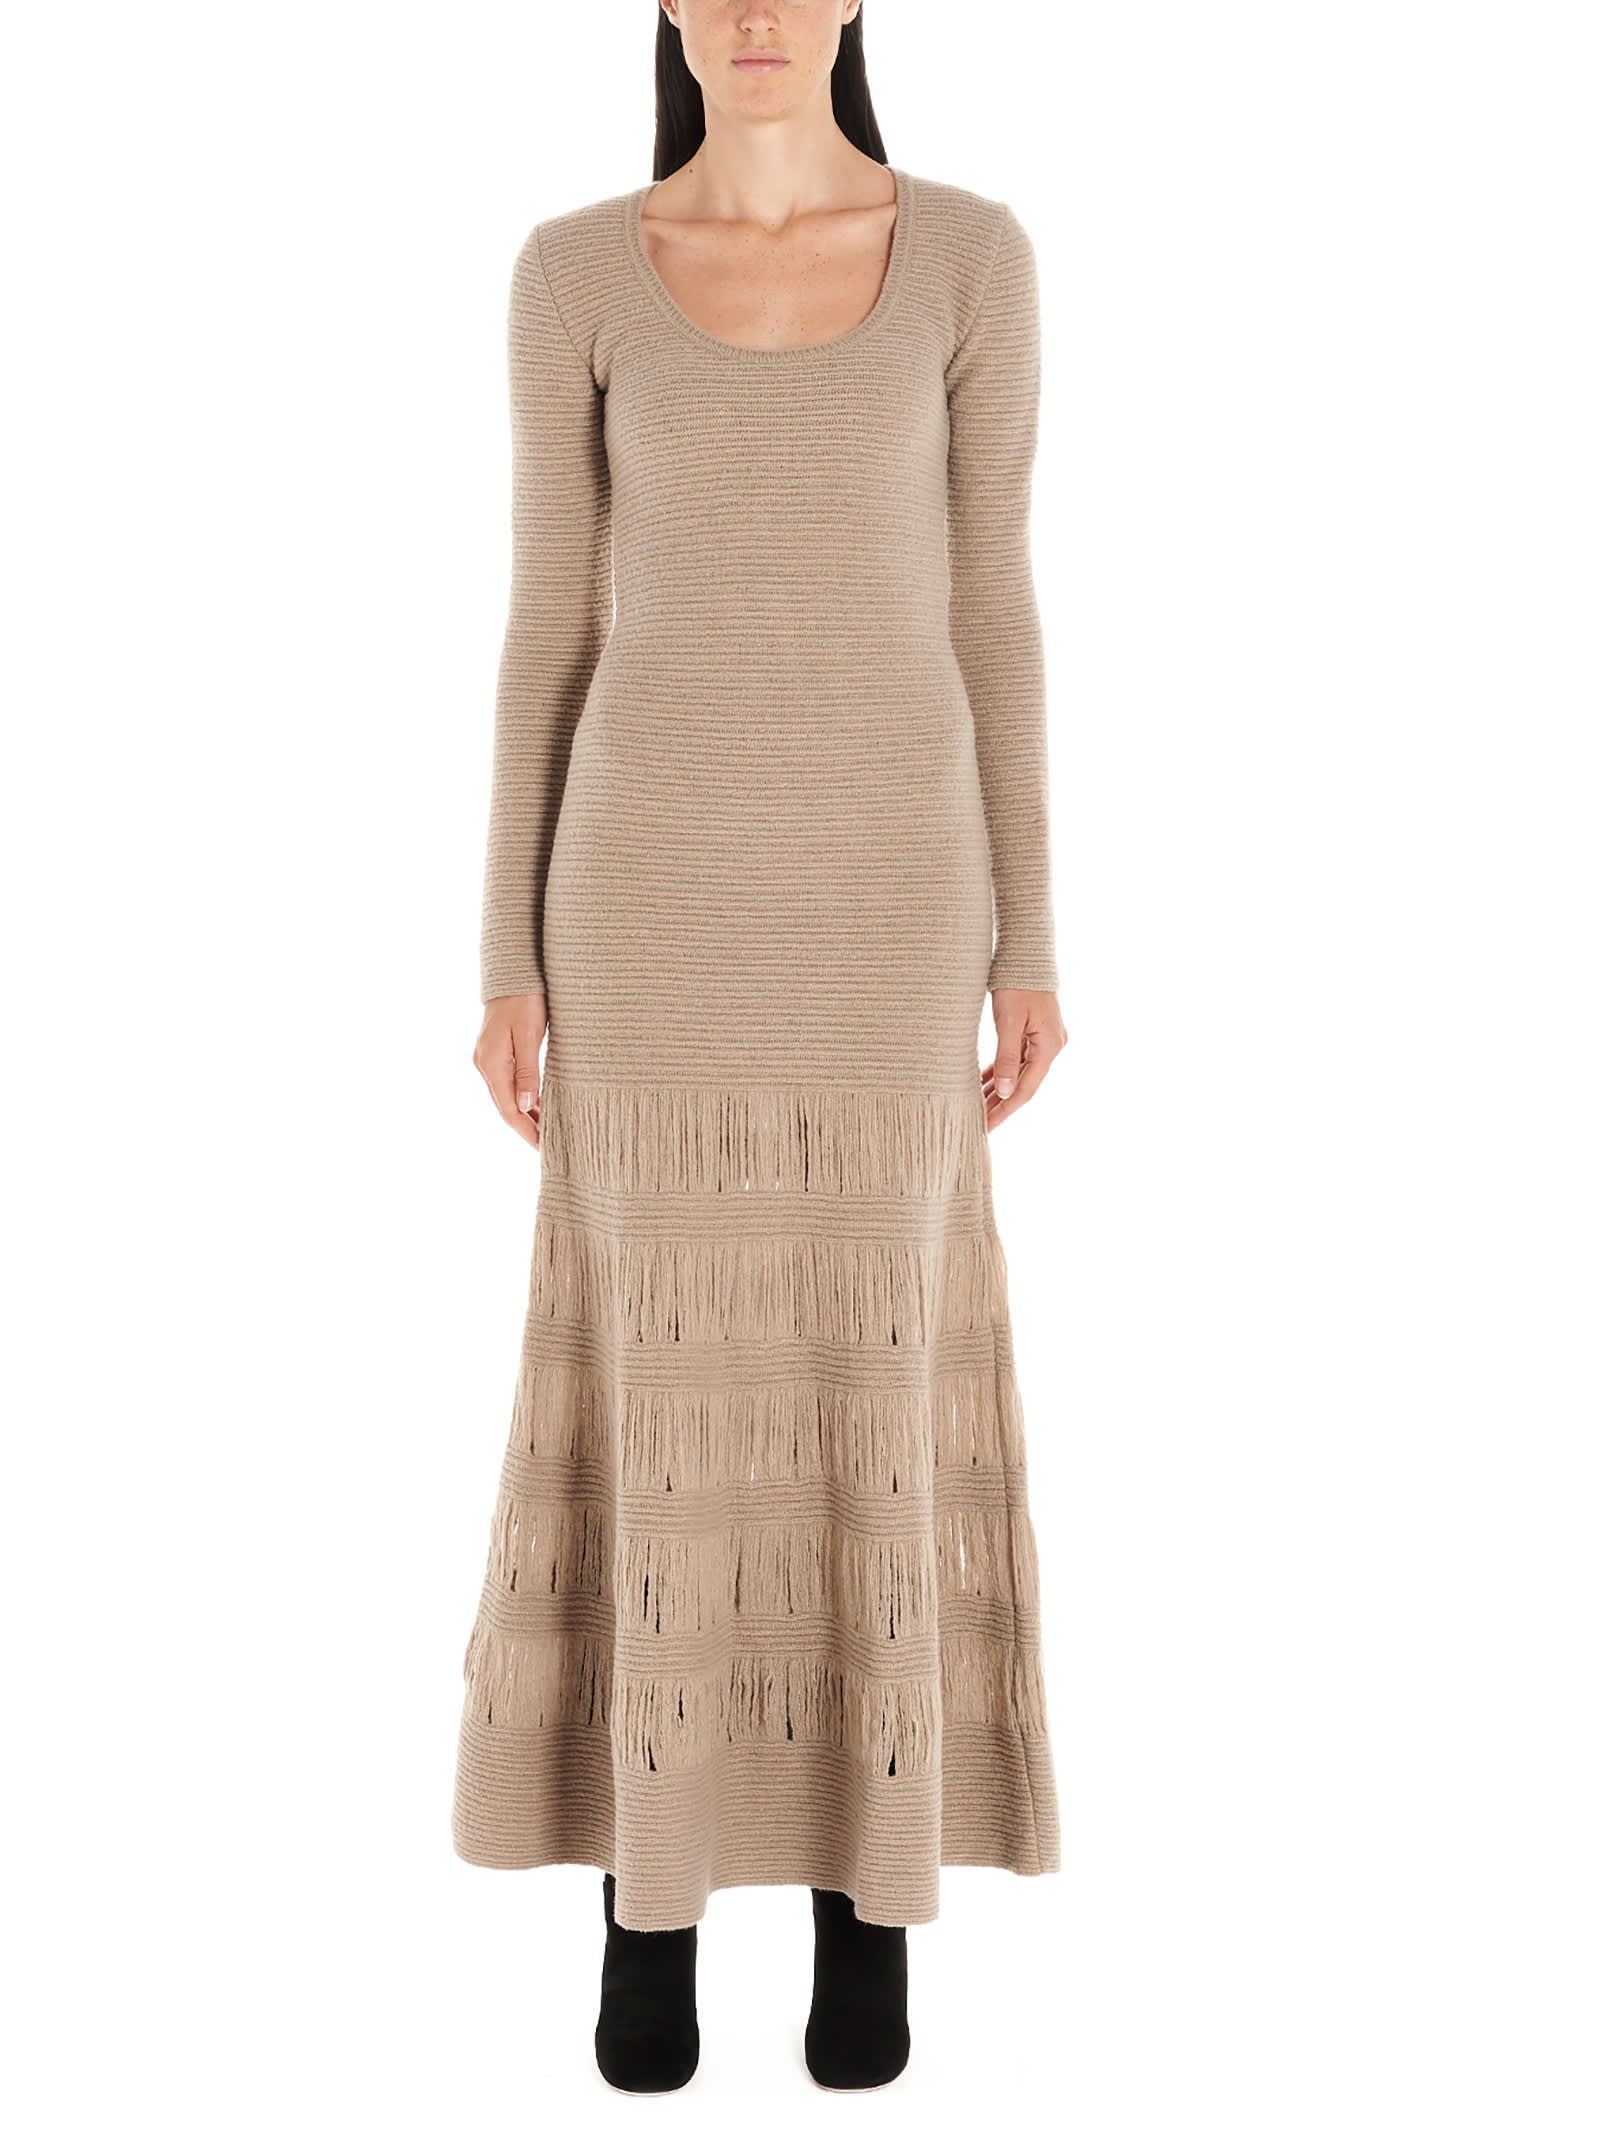 Gabriela Hearst ivanov Dress Dress